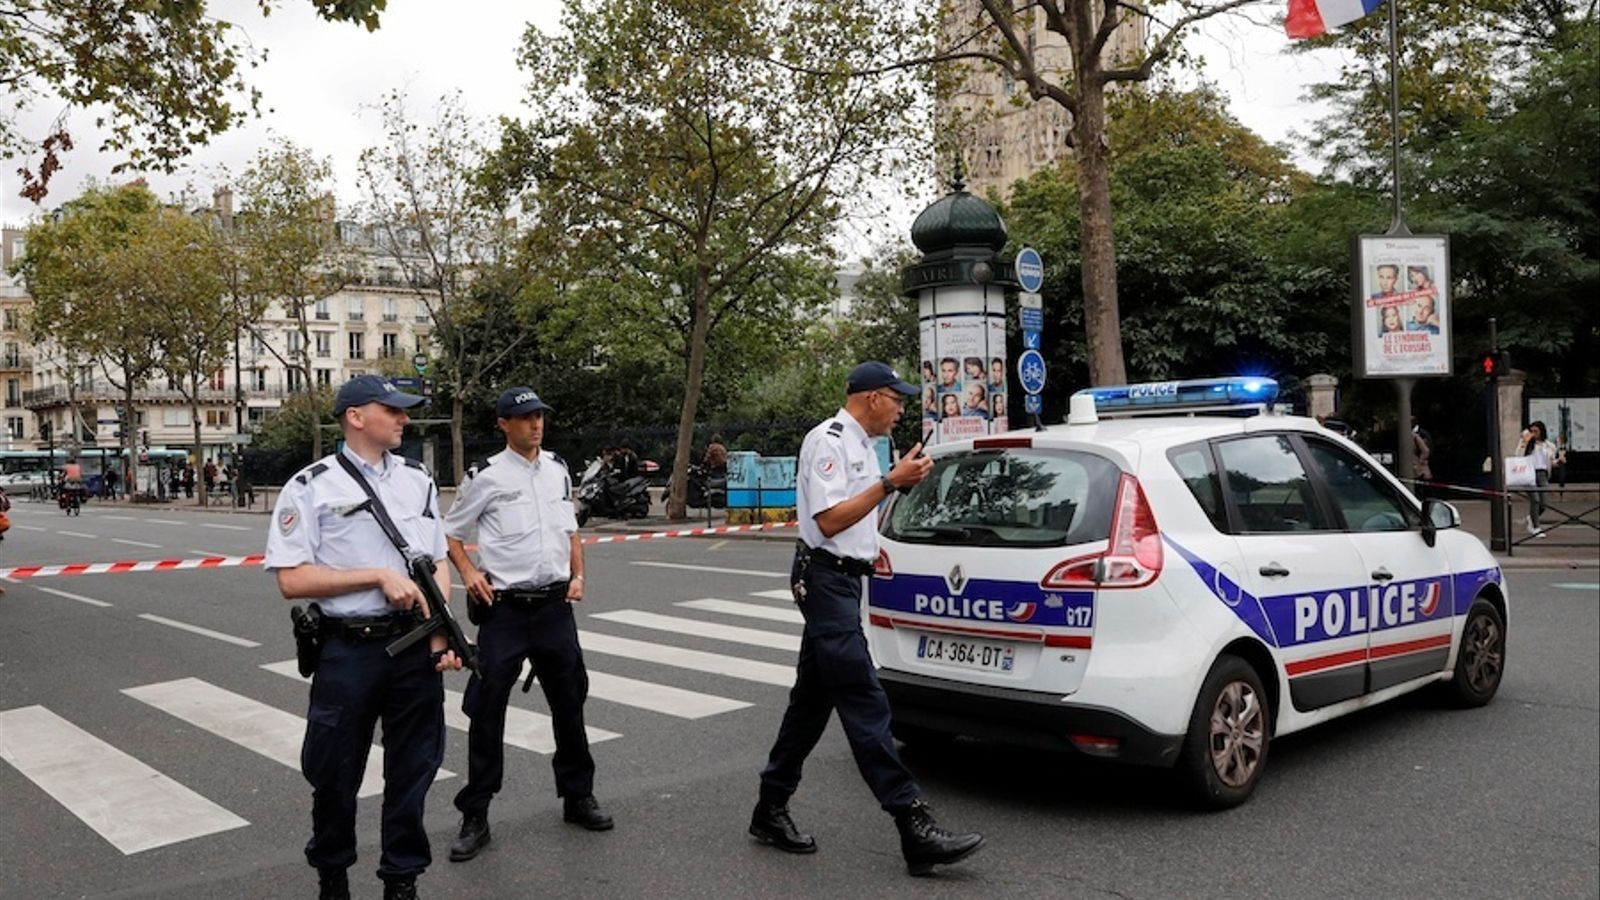 Una falsa alarma desplega una gran operació policial al centre de París